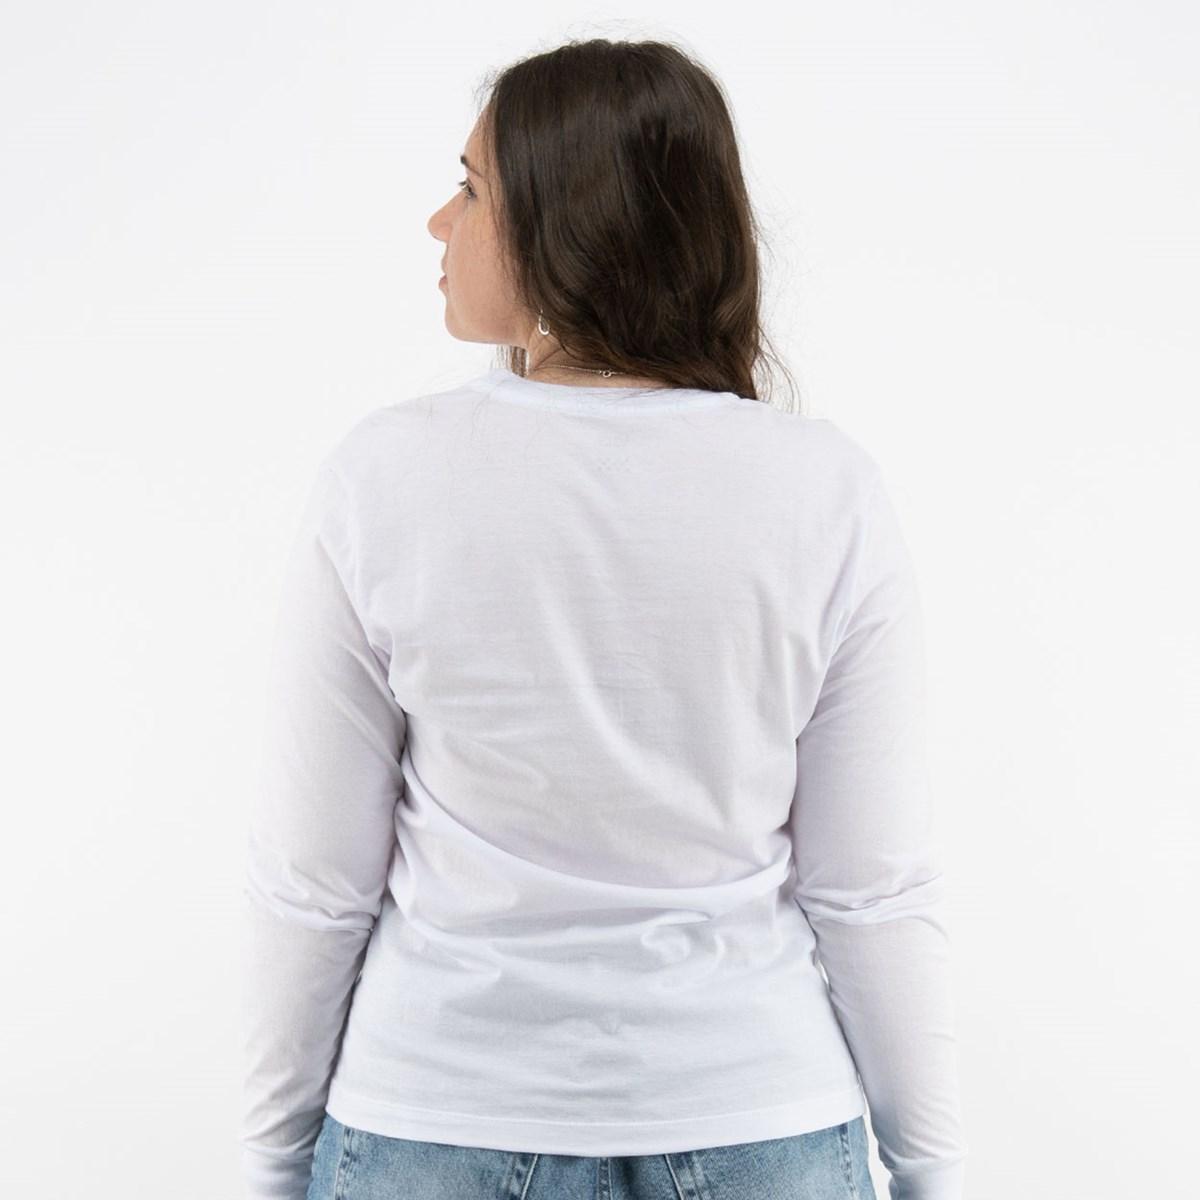 Camiseta Vans Feminina WN Flying V Classic LS BF White VN0A47WNWHT